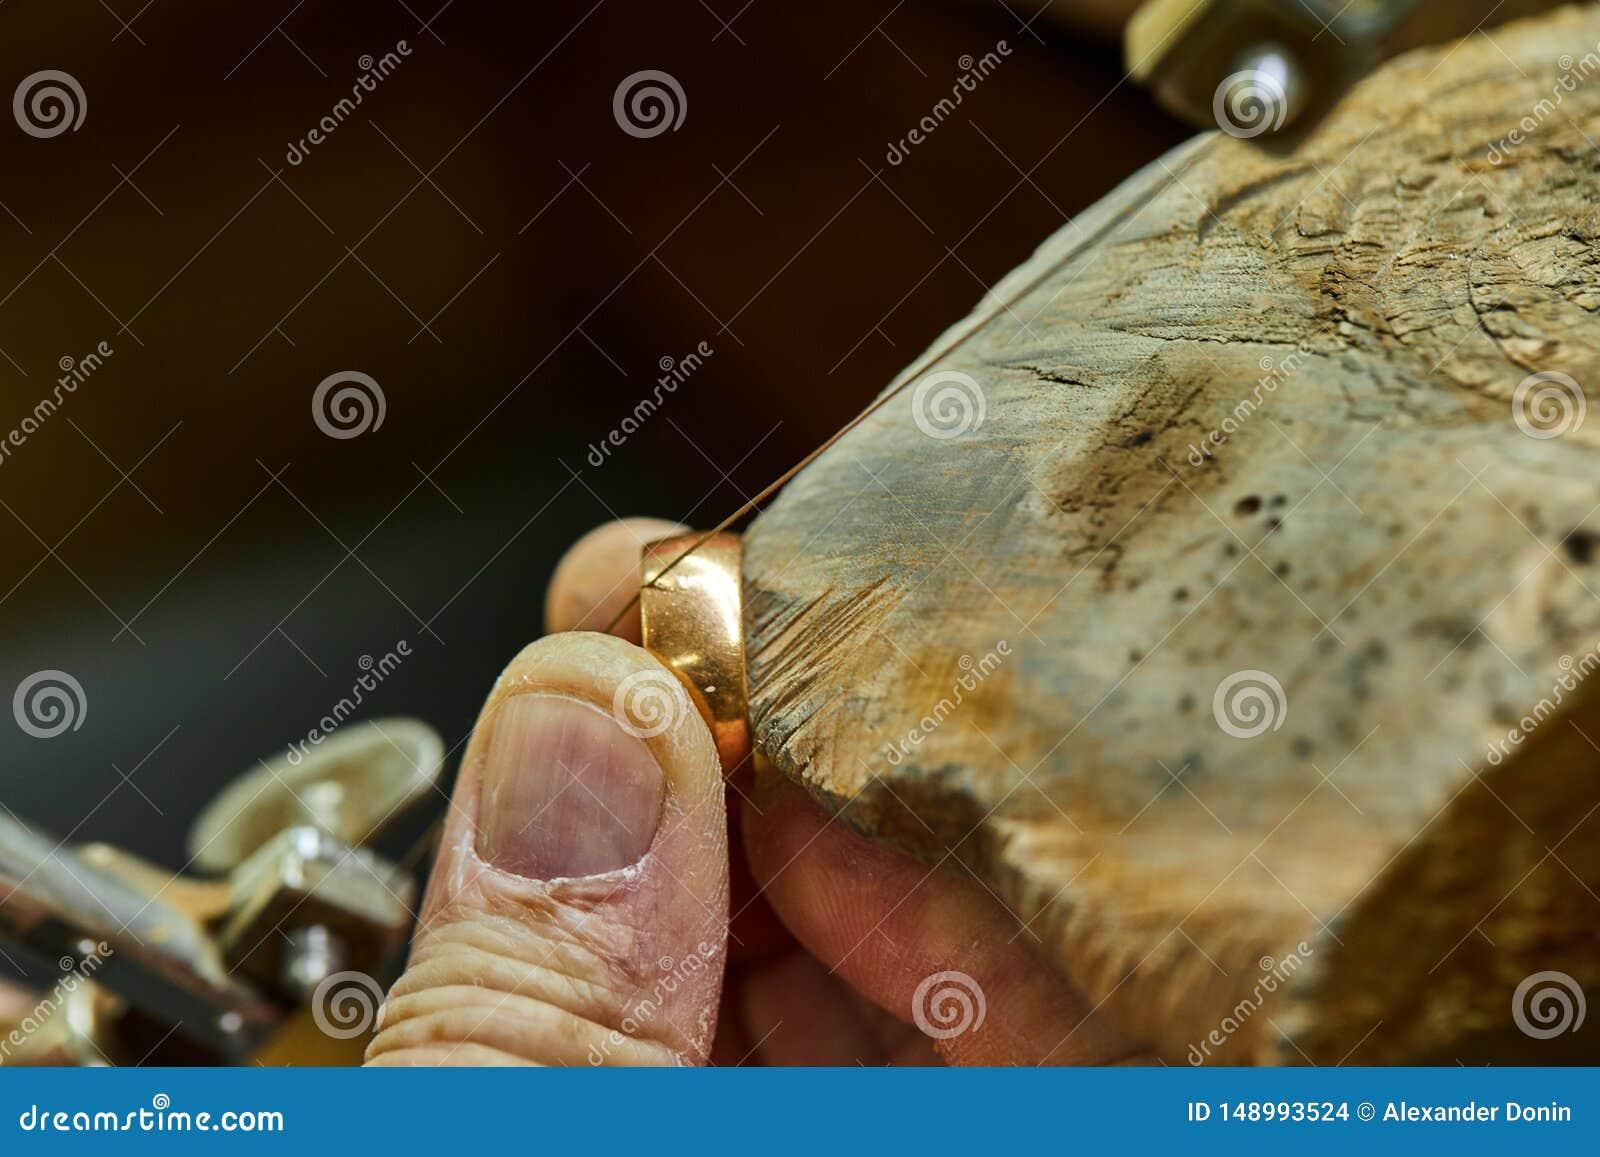 Jewelry production. Jeweler using saw to create jewelry